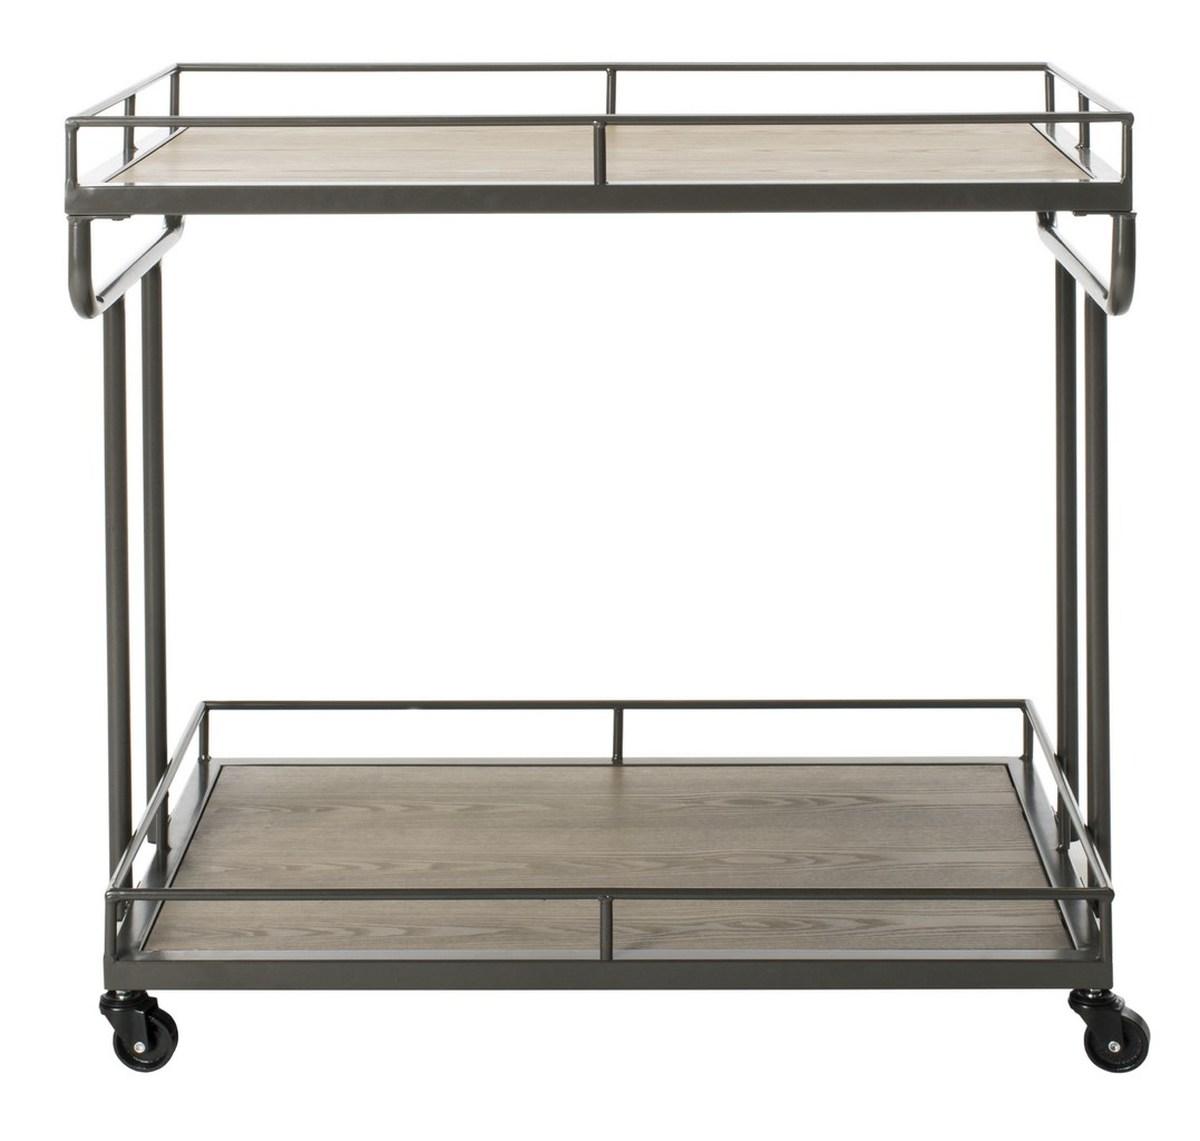 Bct6200a Bar Carts Furniture By Safavieh